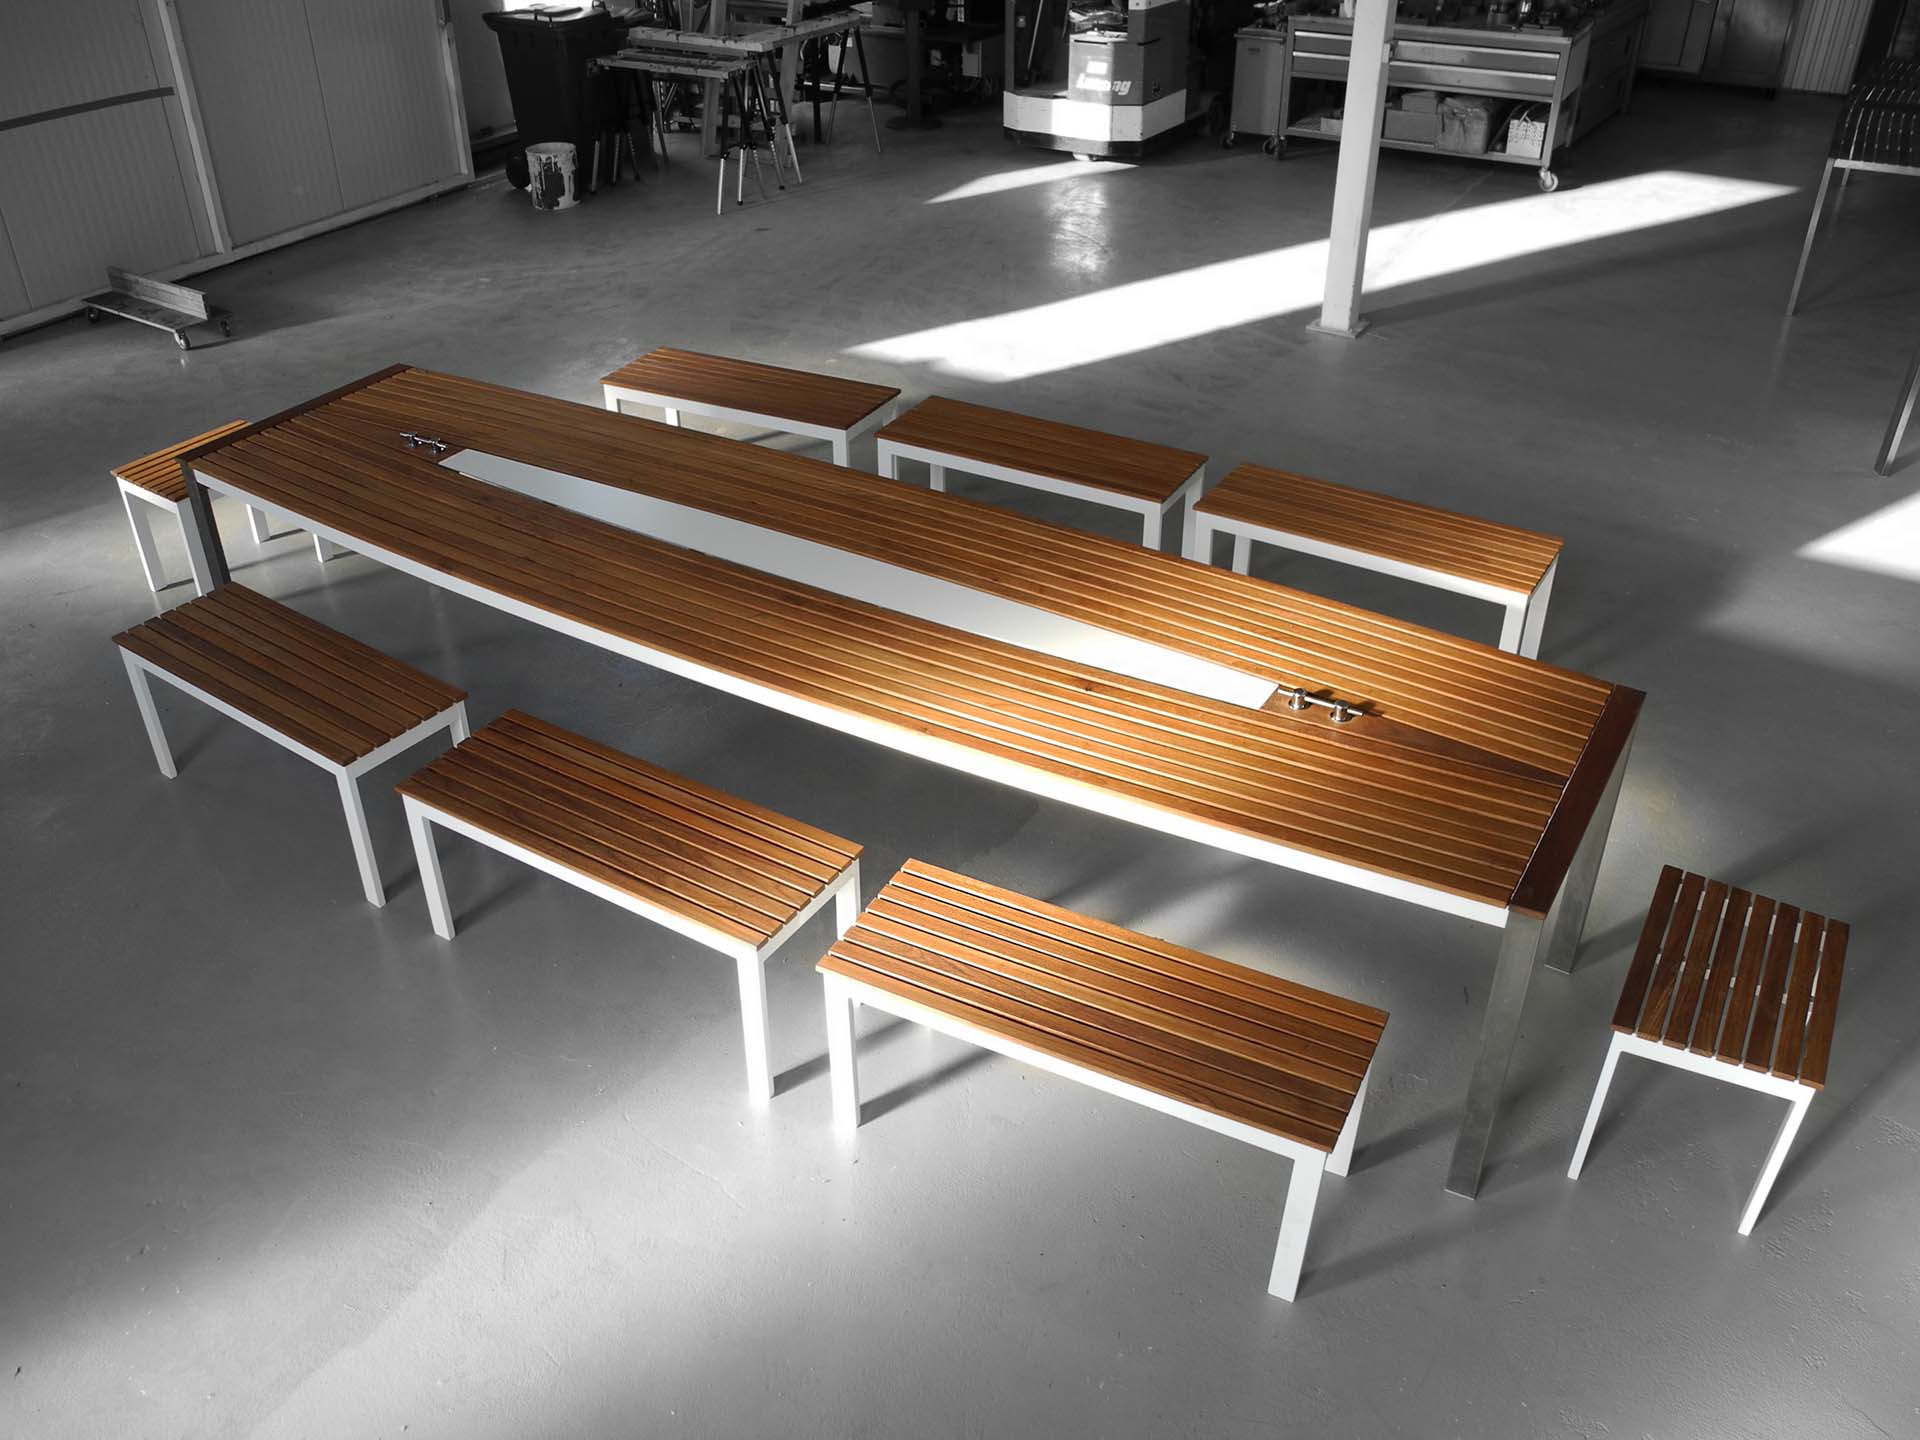 Design Tisch Sealine Nummer 6 aus Teak-Holz Edel-Stahl by Sebastian Bohry timeless design